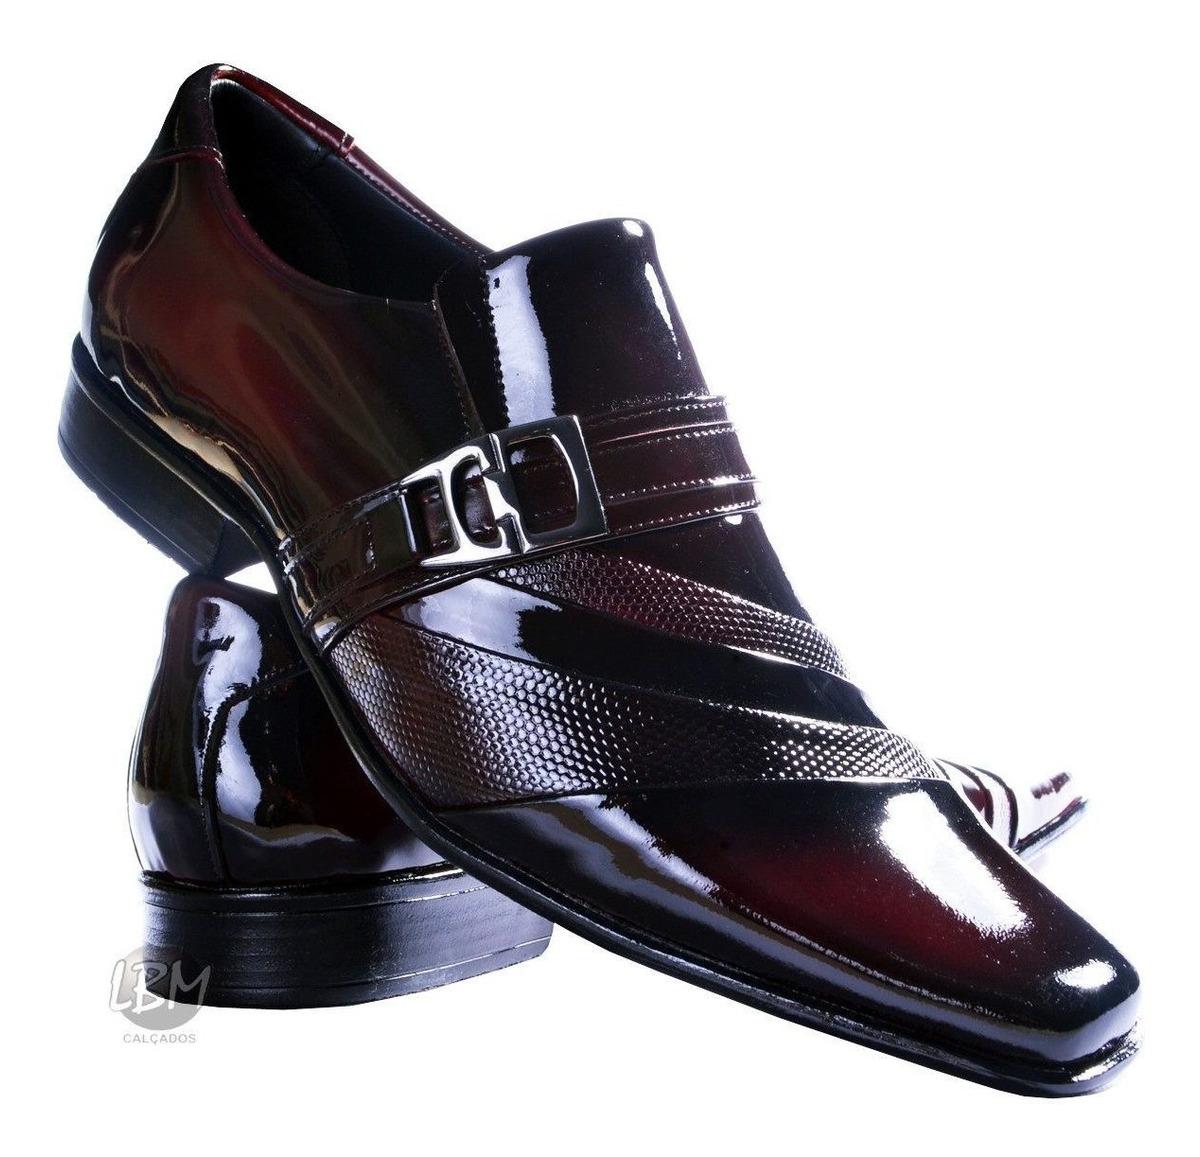 e33f6b80d7 super sapato social masculino italiano couro verniz vinho. Carregando zoom.